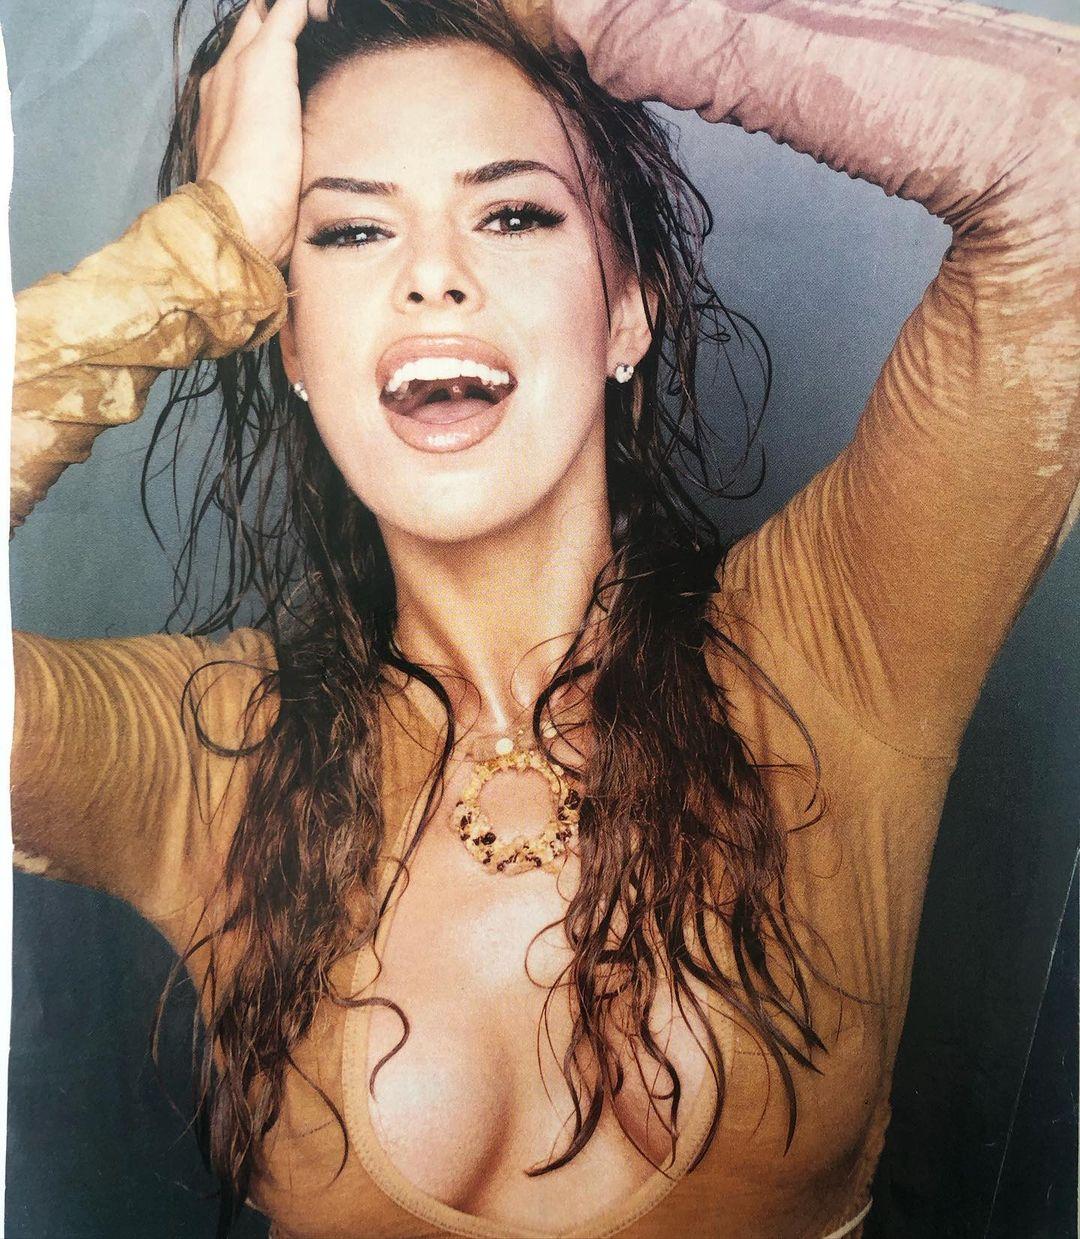 Rosa Blasi breast pics